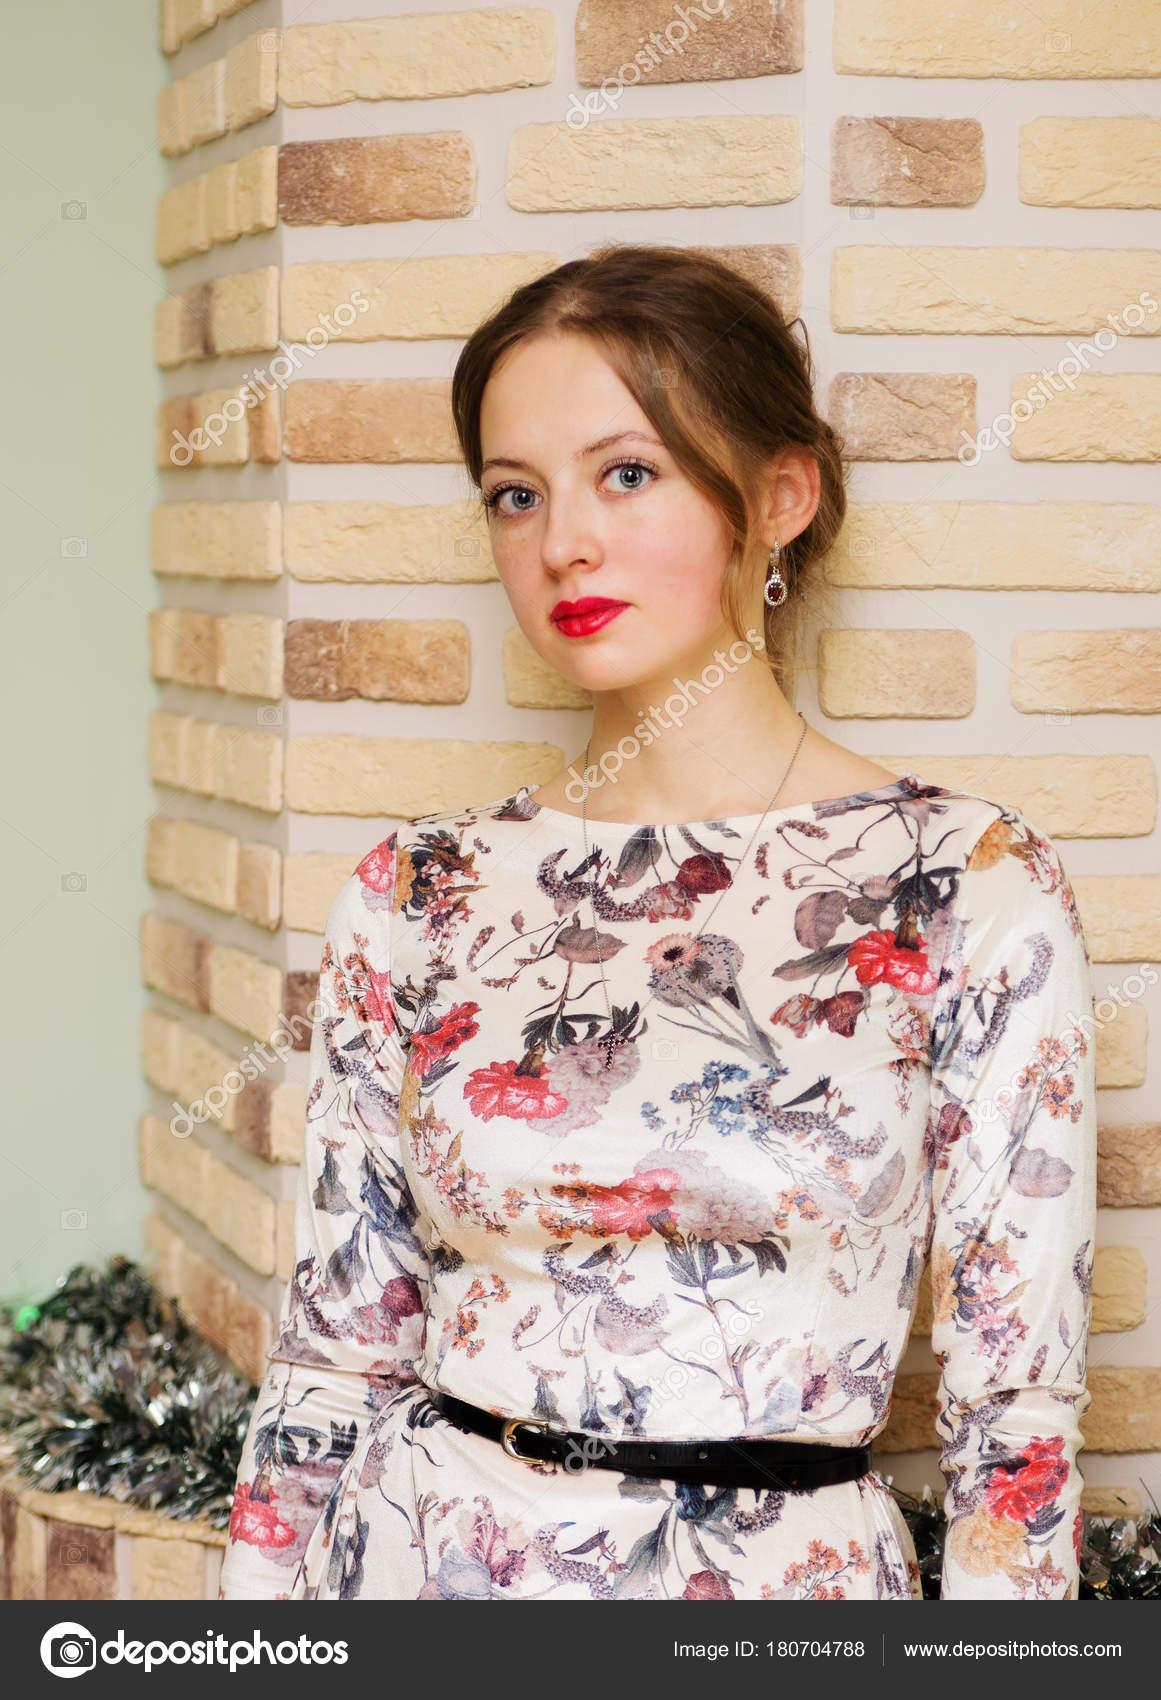 Частный красивой девушки фото, онлайн бомж трахает